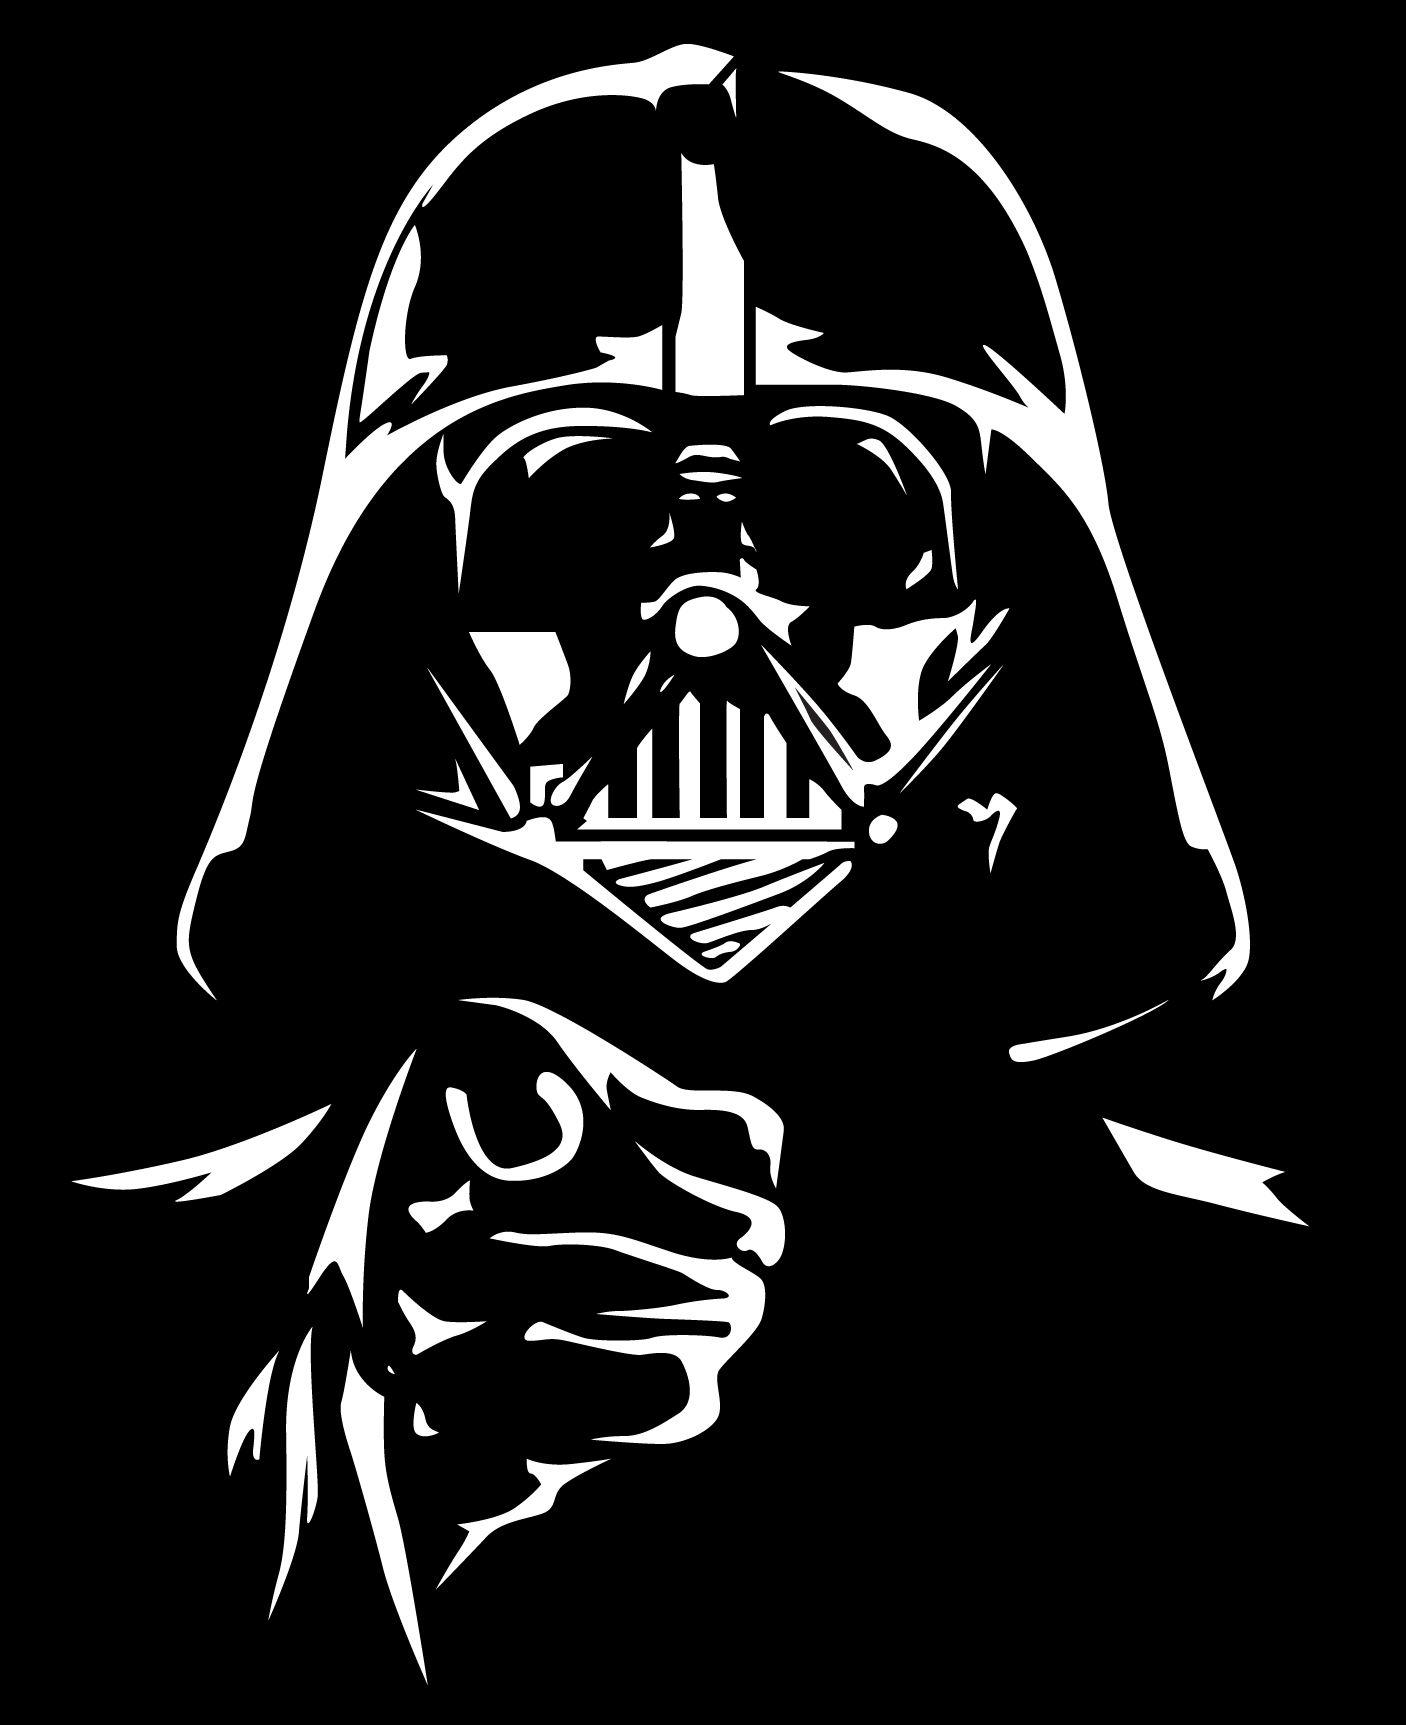 Star Wars Clipart Free Clip Art Images   Boys - Star Wars ...